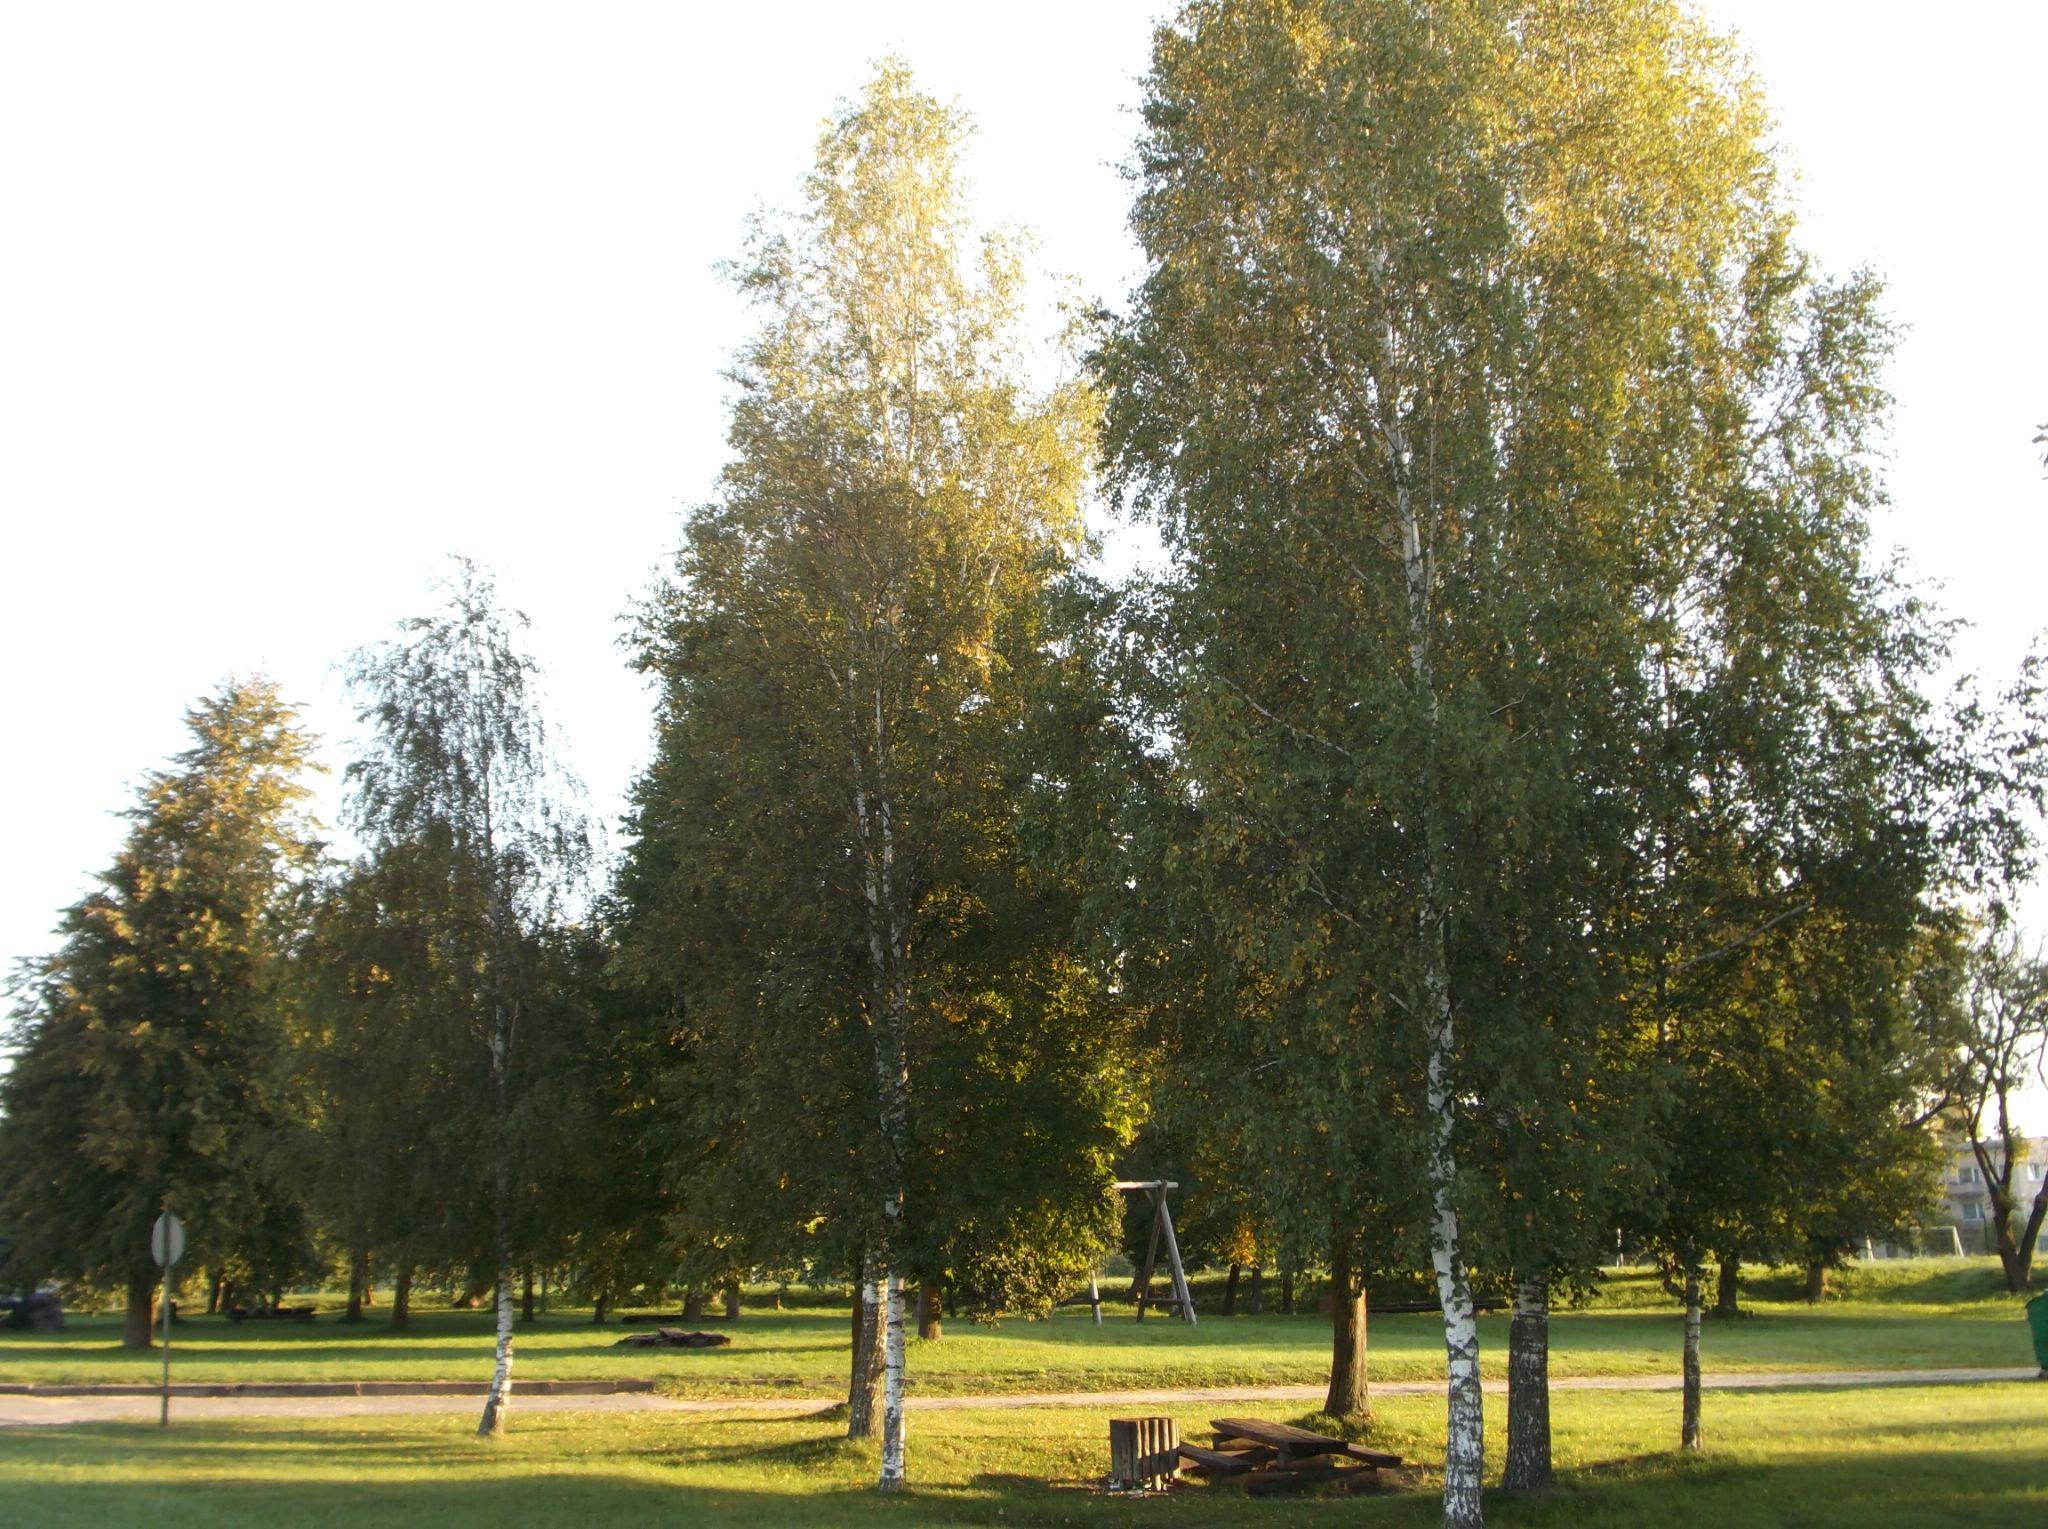 Birch trees in autumn. by Zita Užkuraitienė